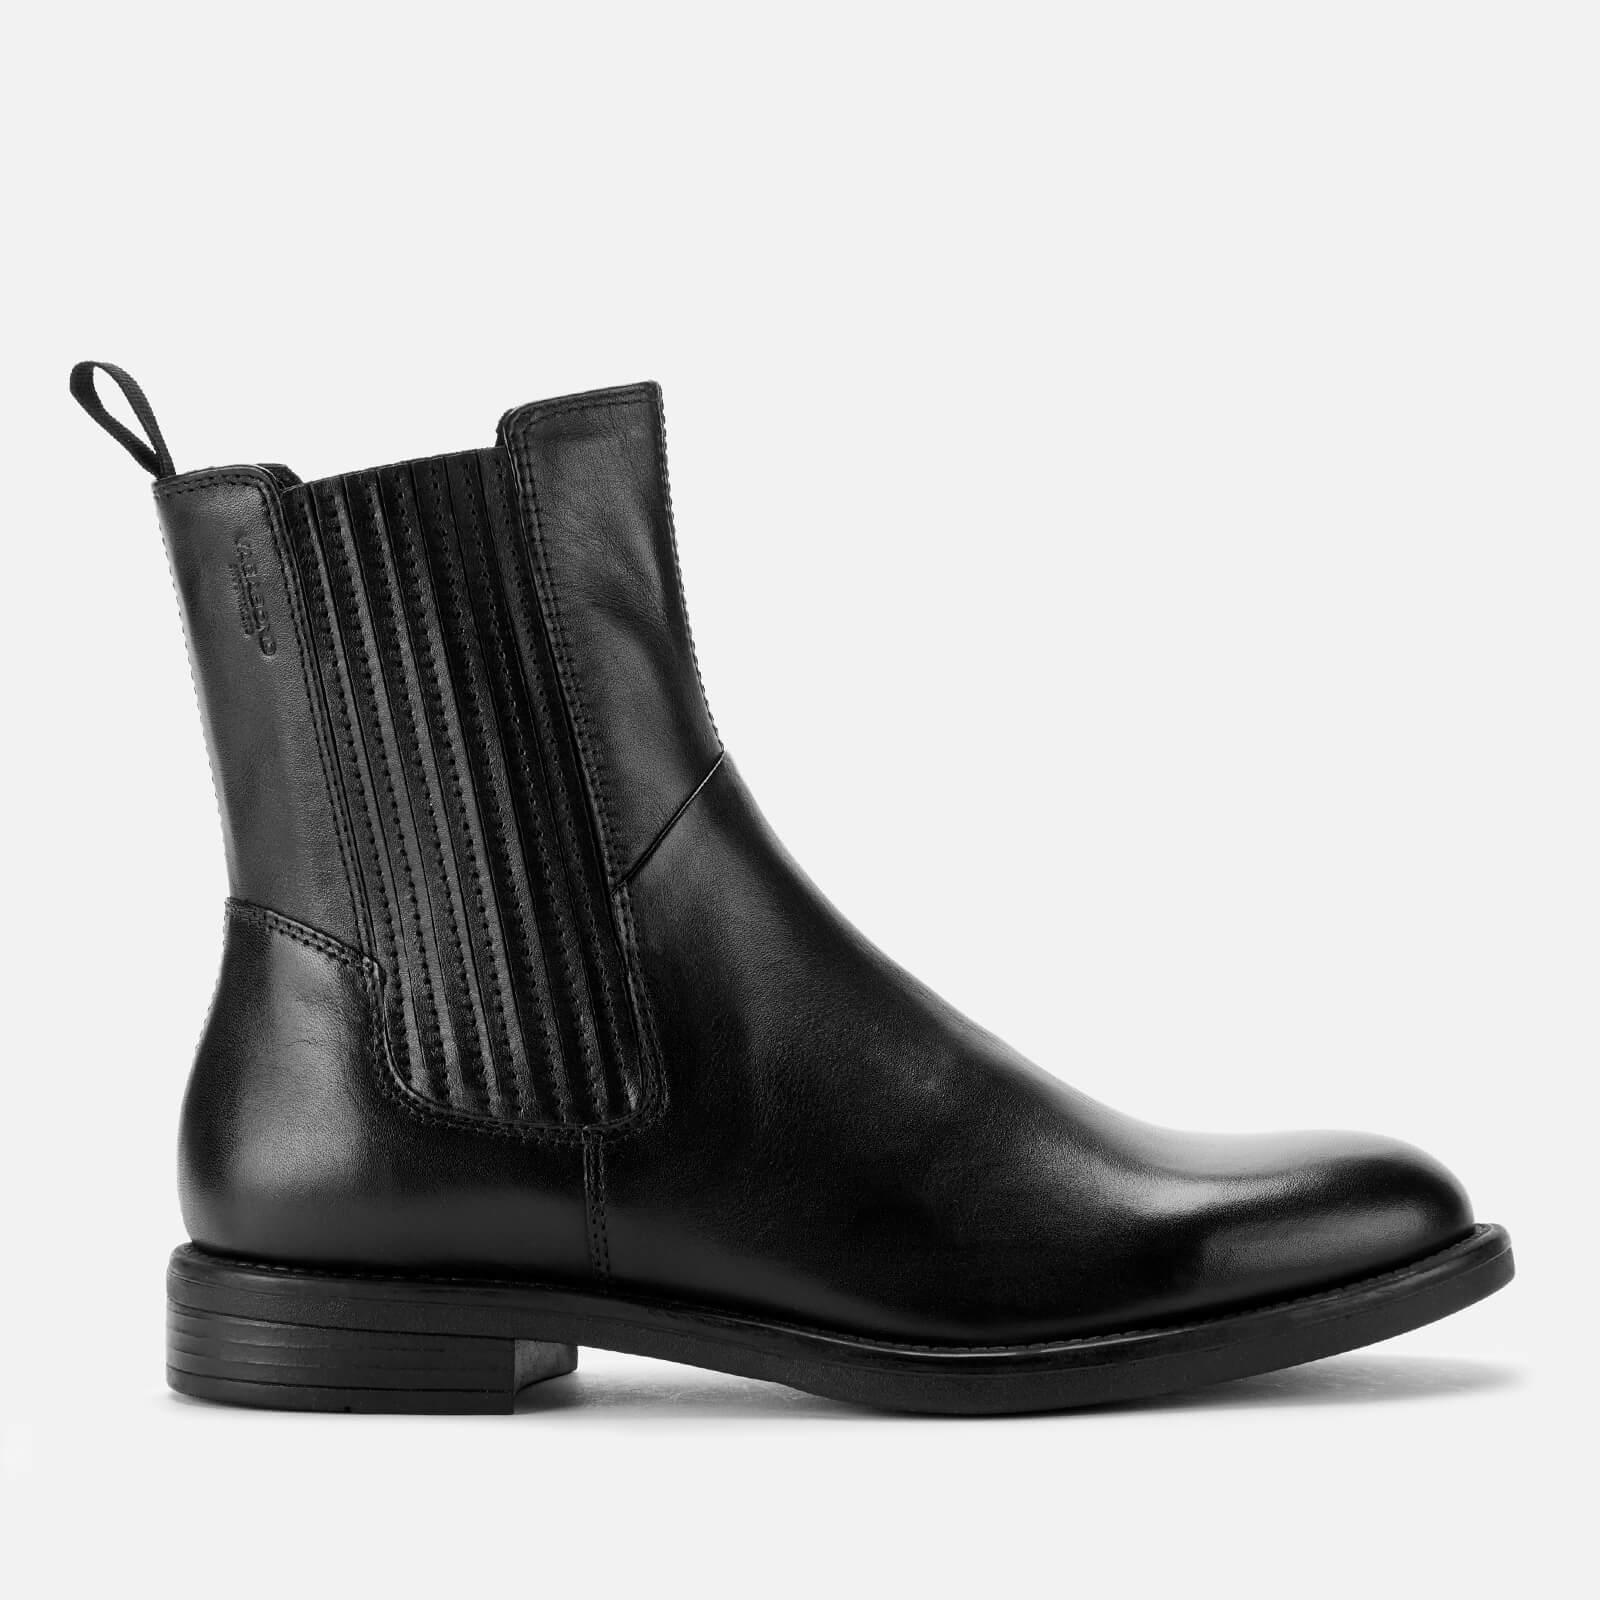 Amina Leather Chelsea Boots - Black